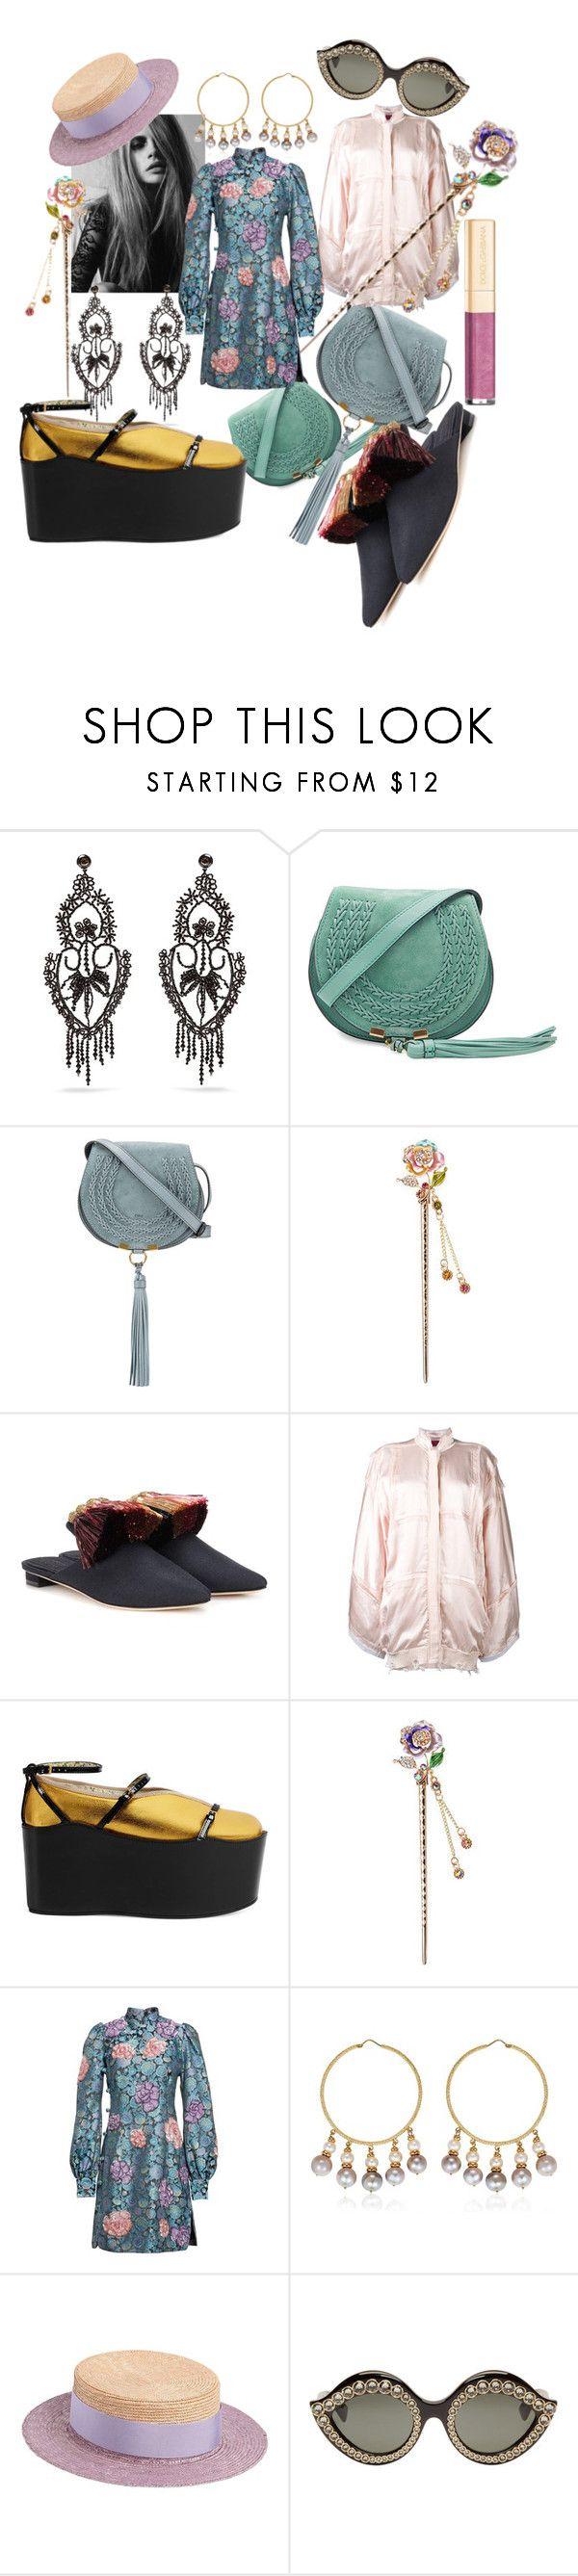 """#77  Spring 2017"" by marina-antipanova ❤ liked on Polyvore featuring Gucci, Chloé, Sanayi 313, Di Liborio, Marc Jacobs, Carolina Bucci, Federica Moretti and Dolce&Gabbana"